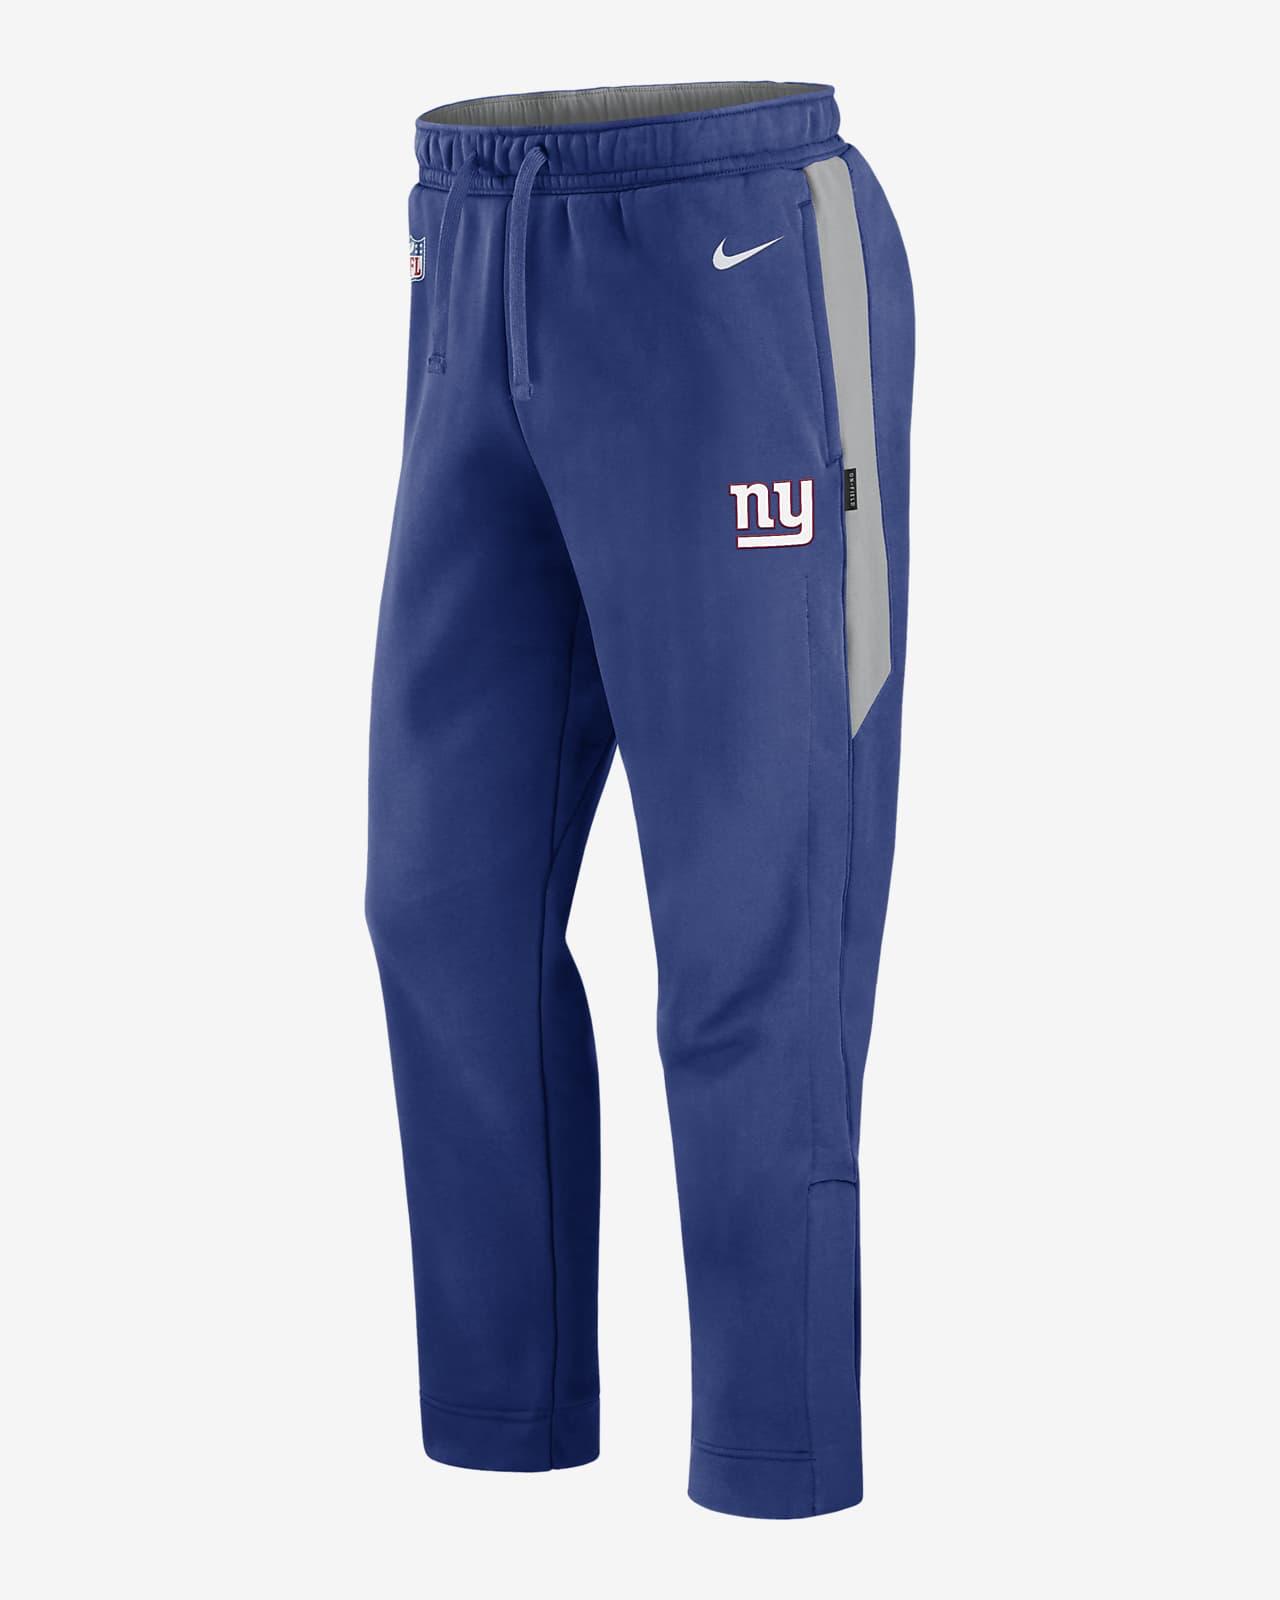 Pants para hombre Nike Sideline Showout (NFL New York Giants)